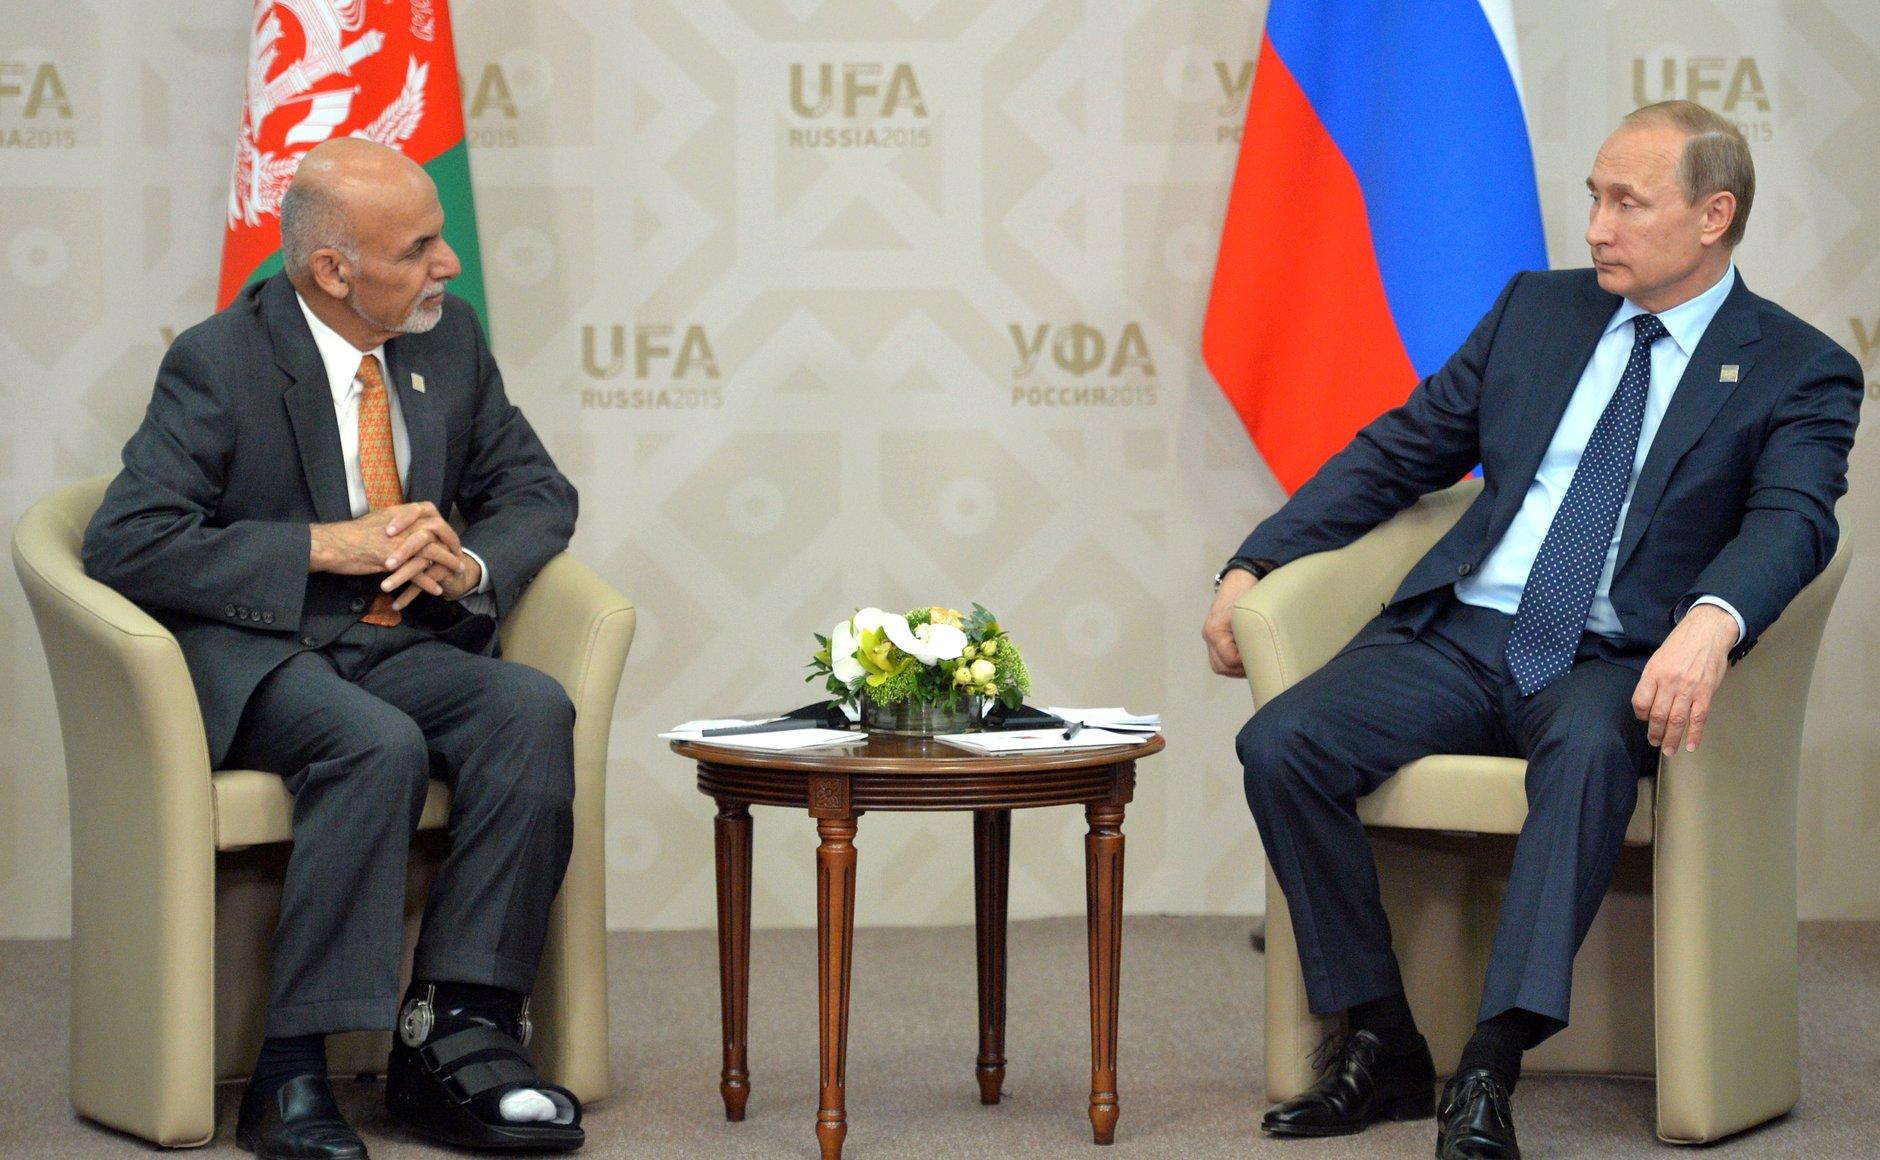 File:Ashraf Ghani Ahmadzai and Vladimir Putin, Ufa.jpg - Wikimedia Commons